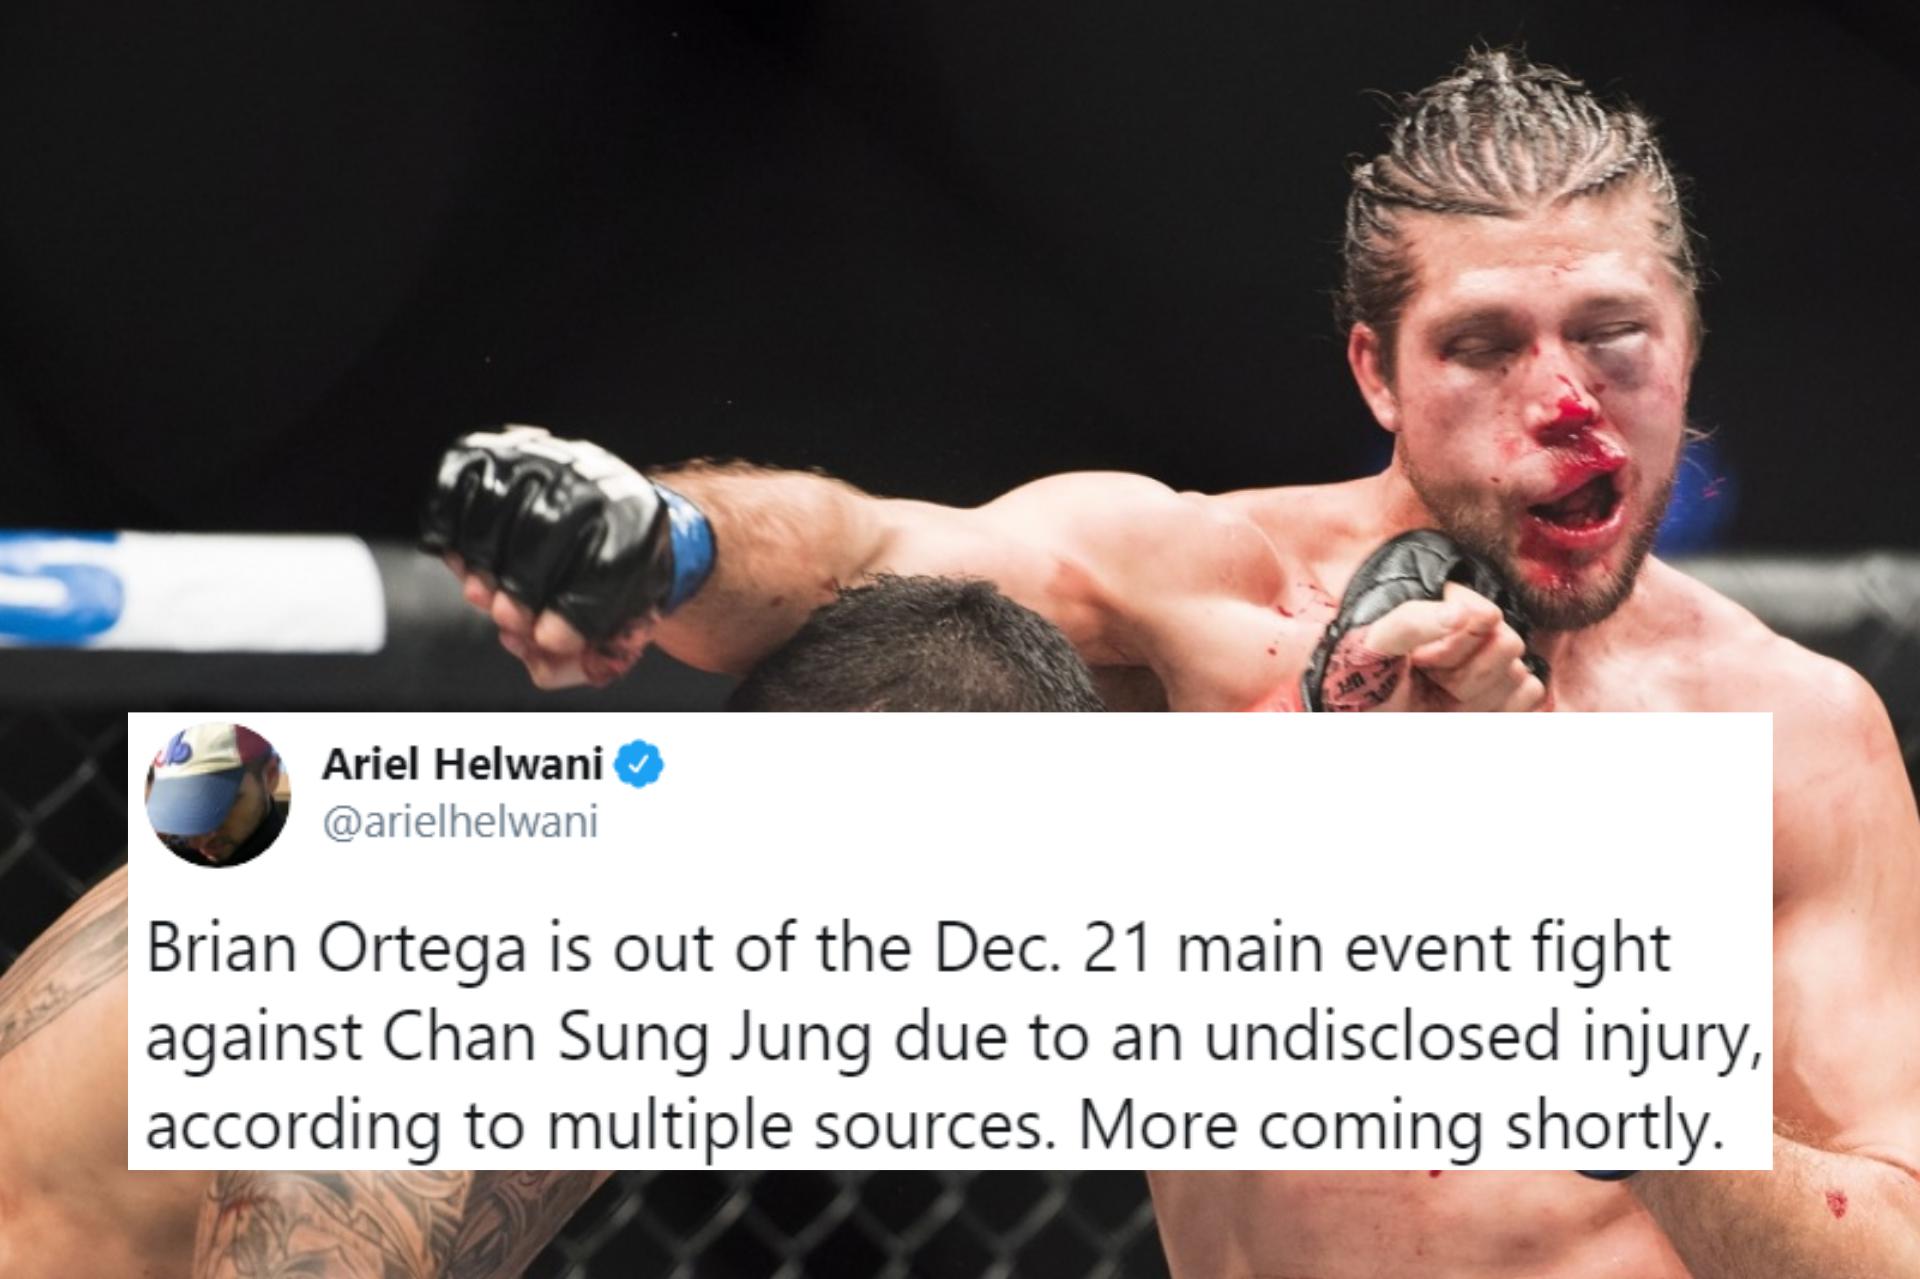 BREAKING: Brian Ortega reportedly out of Korean Zombie fight due to injury - Ortega